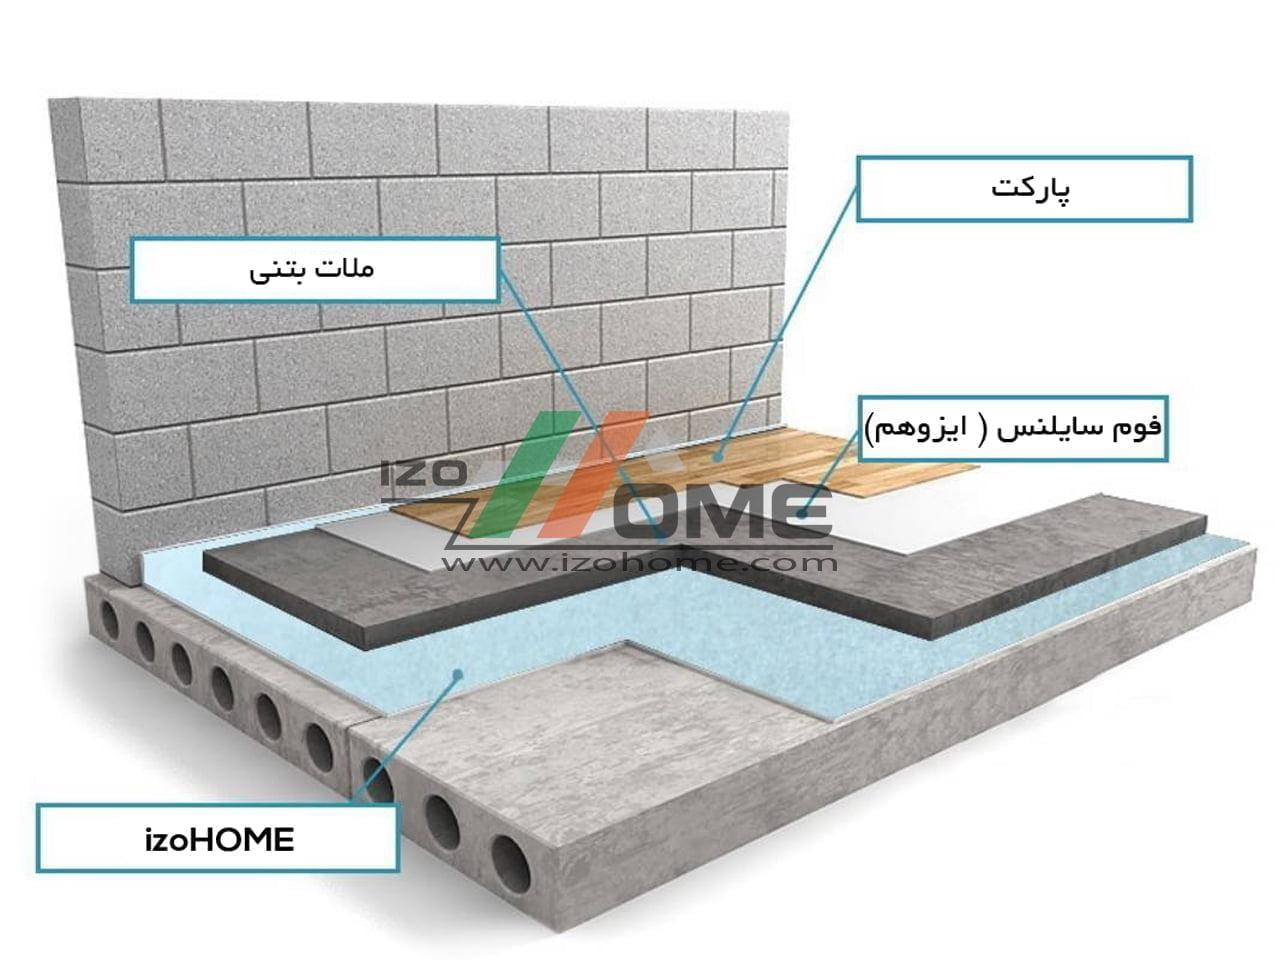 izohome166 - عایق صوتی برای کف